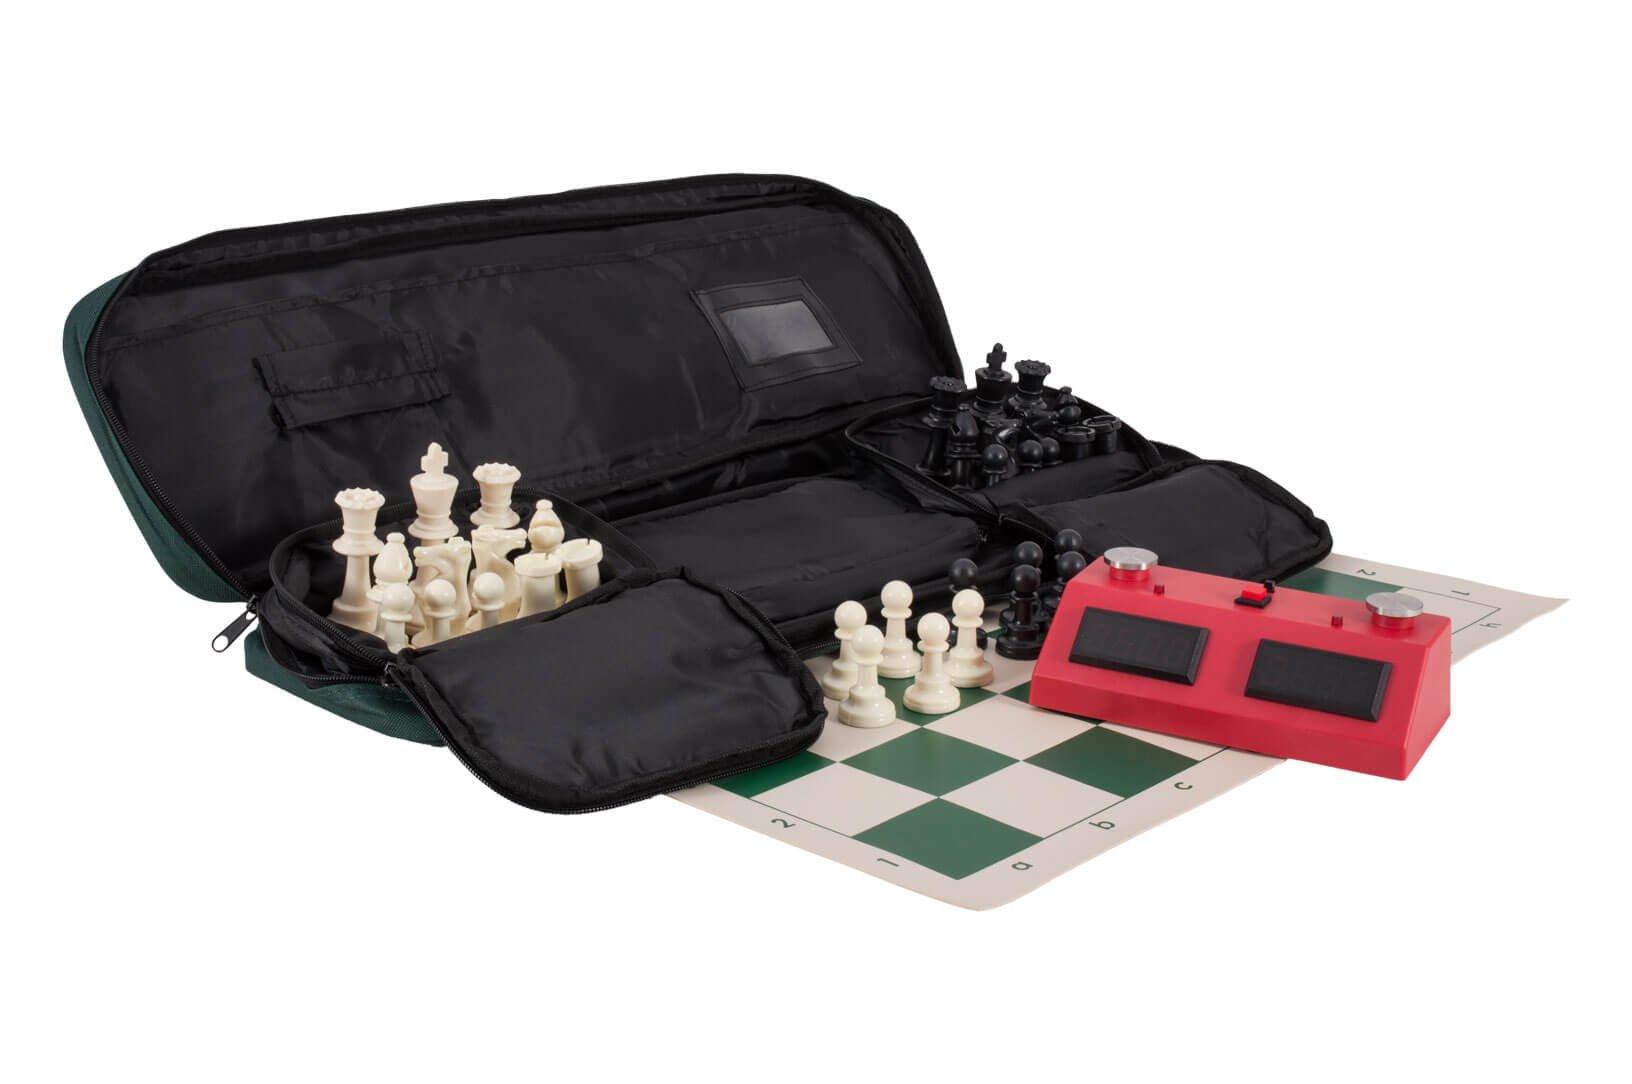 The House of Staunton Deluxe Zmart Fun II Chess Set Combination